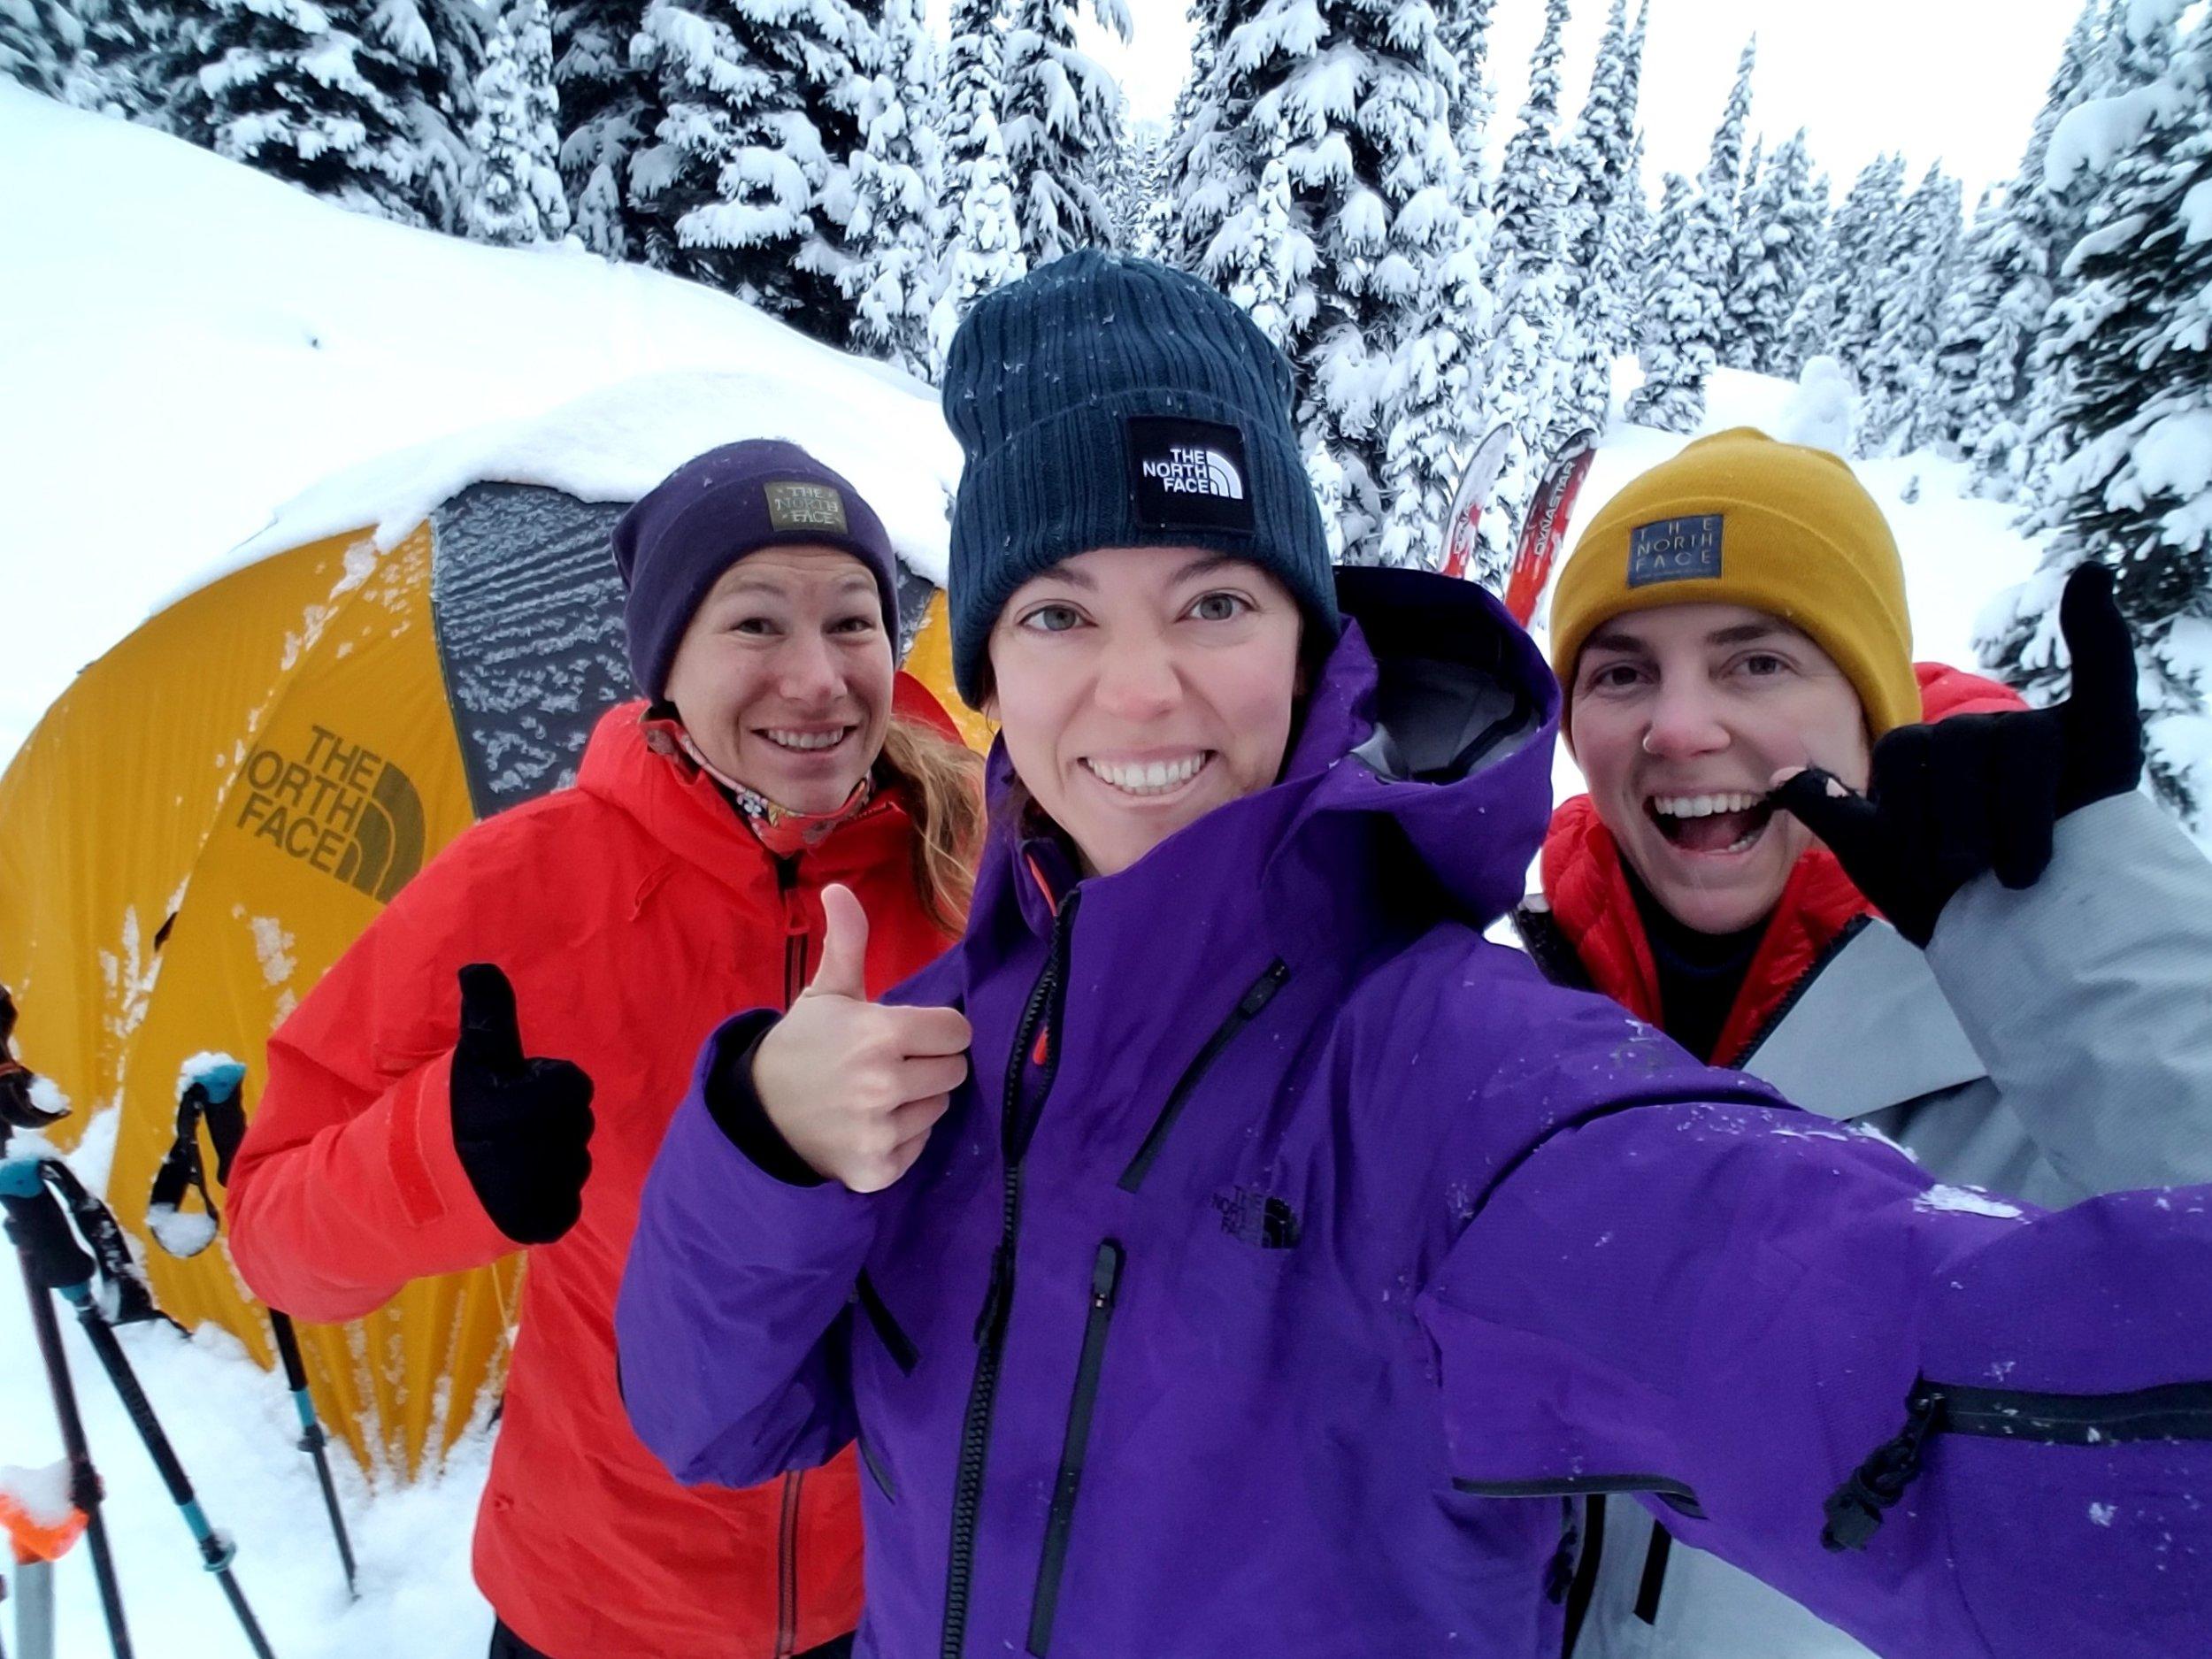 TNF Adventure Grant applicants: Marian, Gaby and Nicole